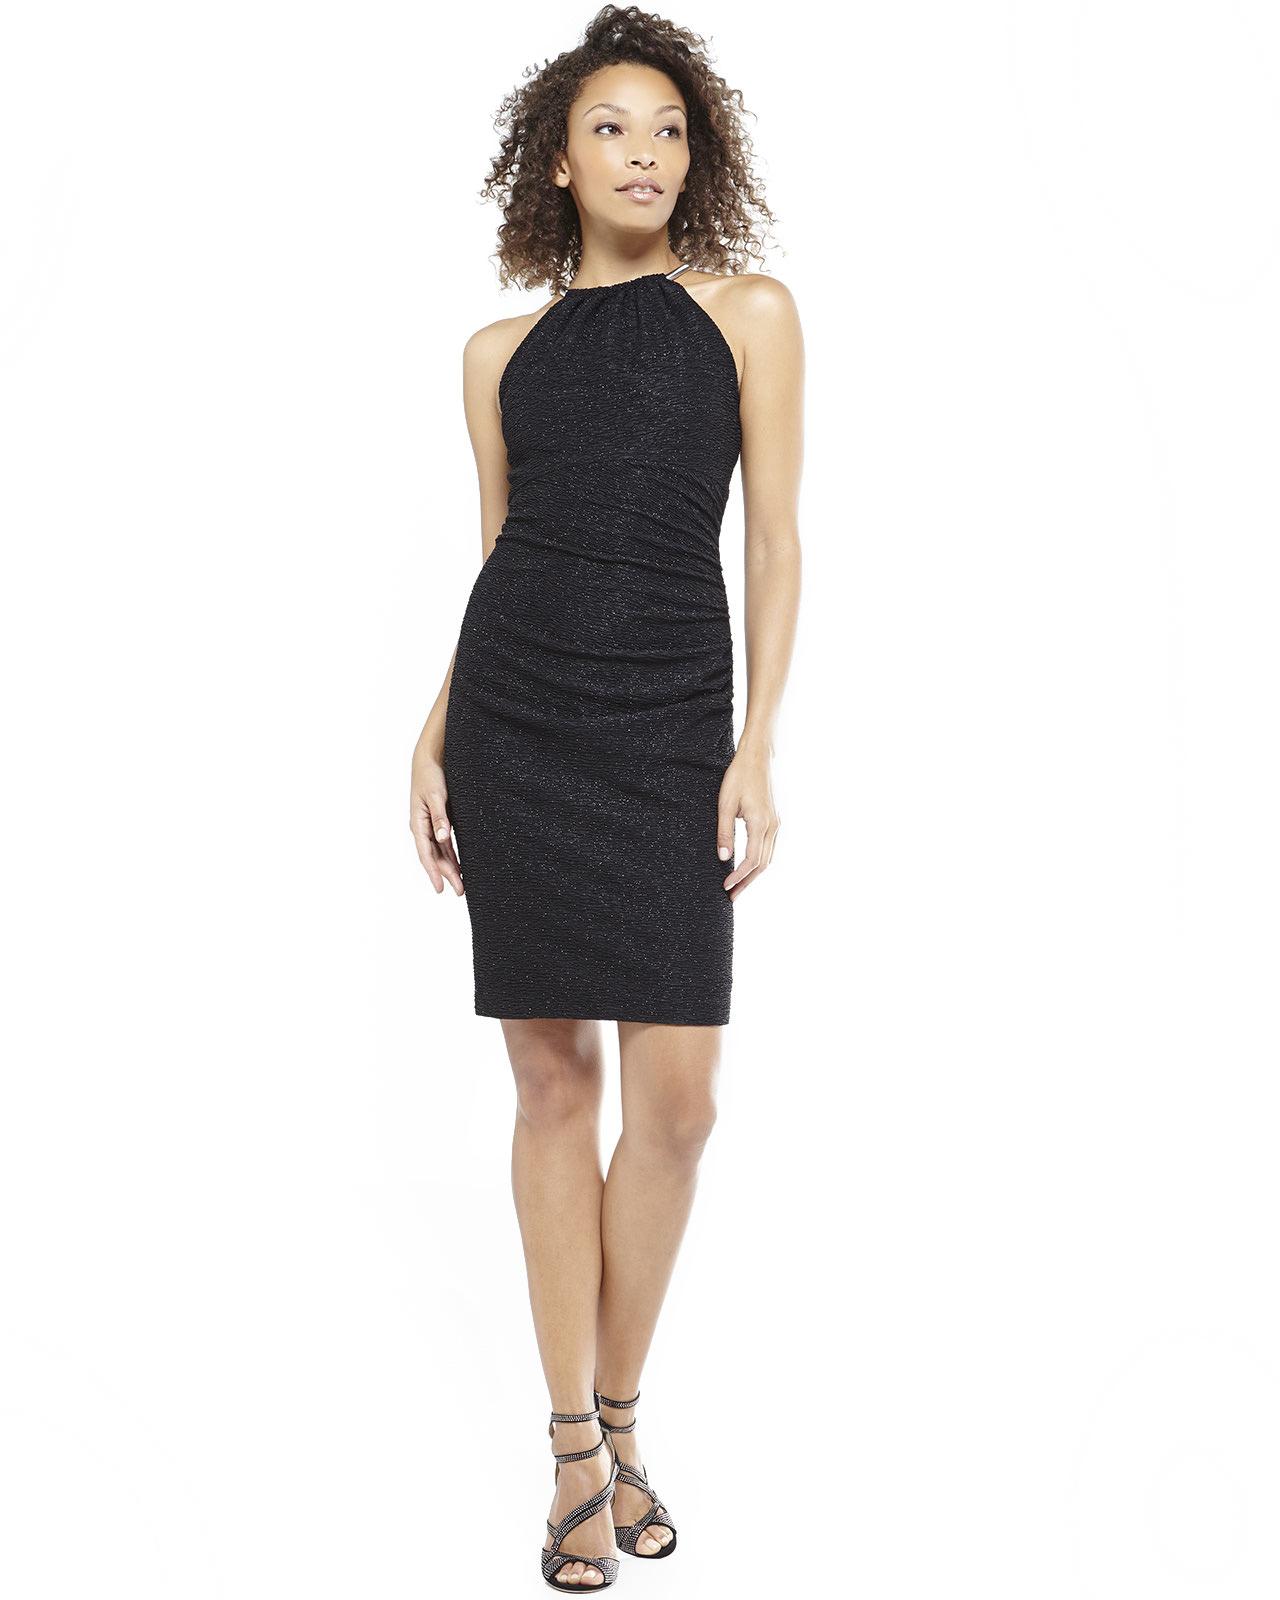 Black dress necklace 1 10